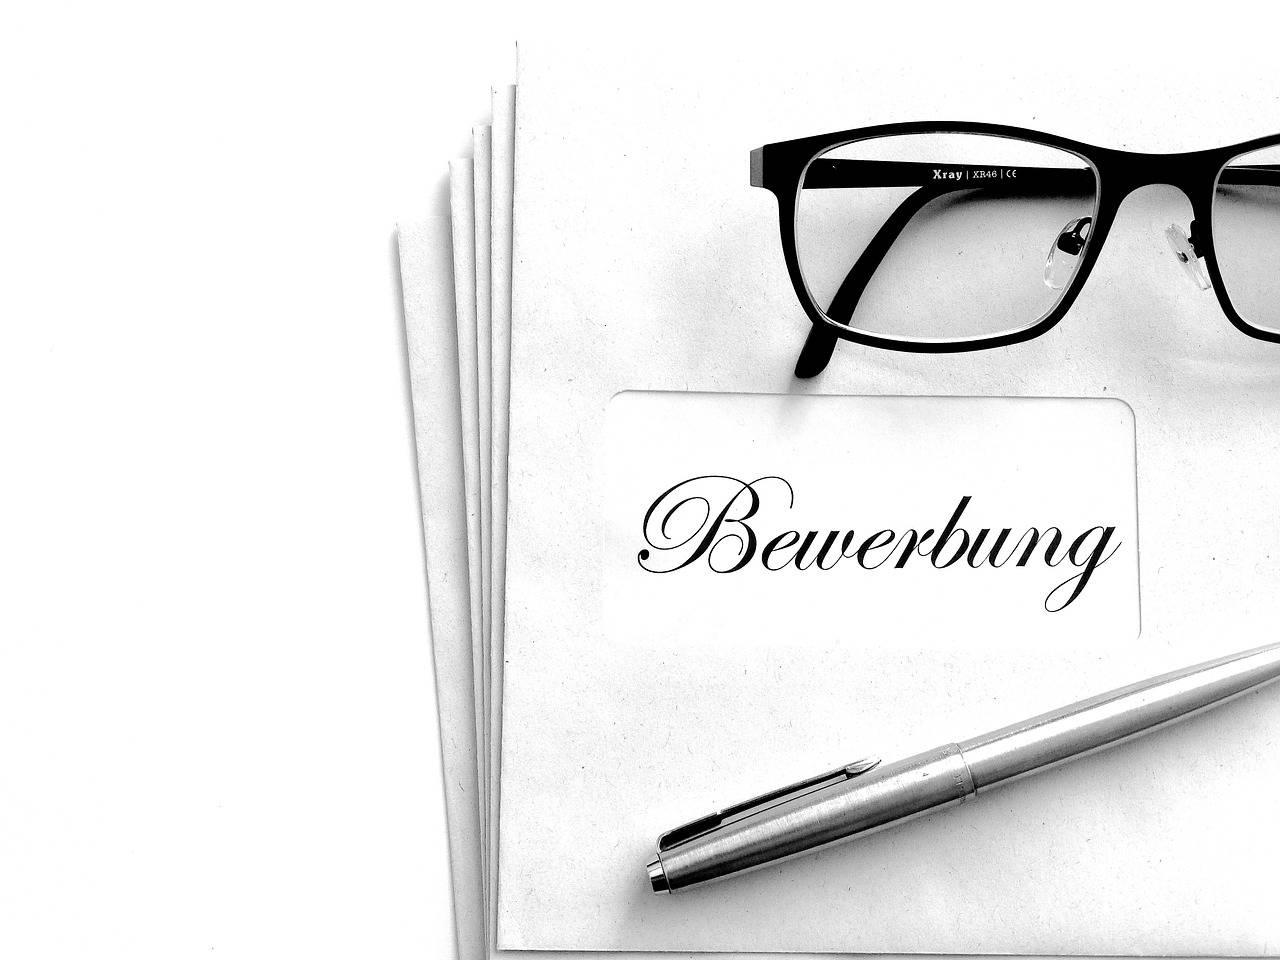 Die Perfekte Bewerbung Ideal Oder Sackgasse Christoph Burger